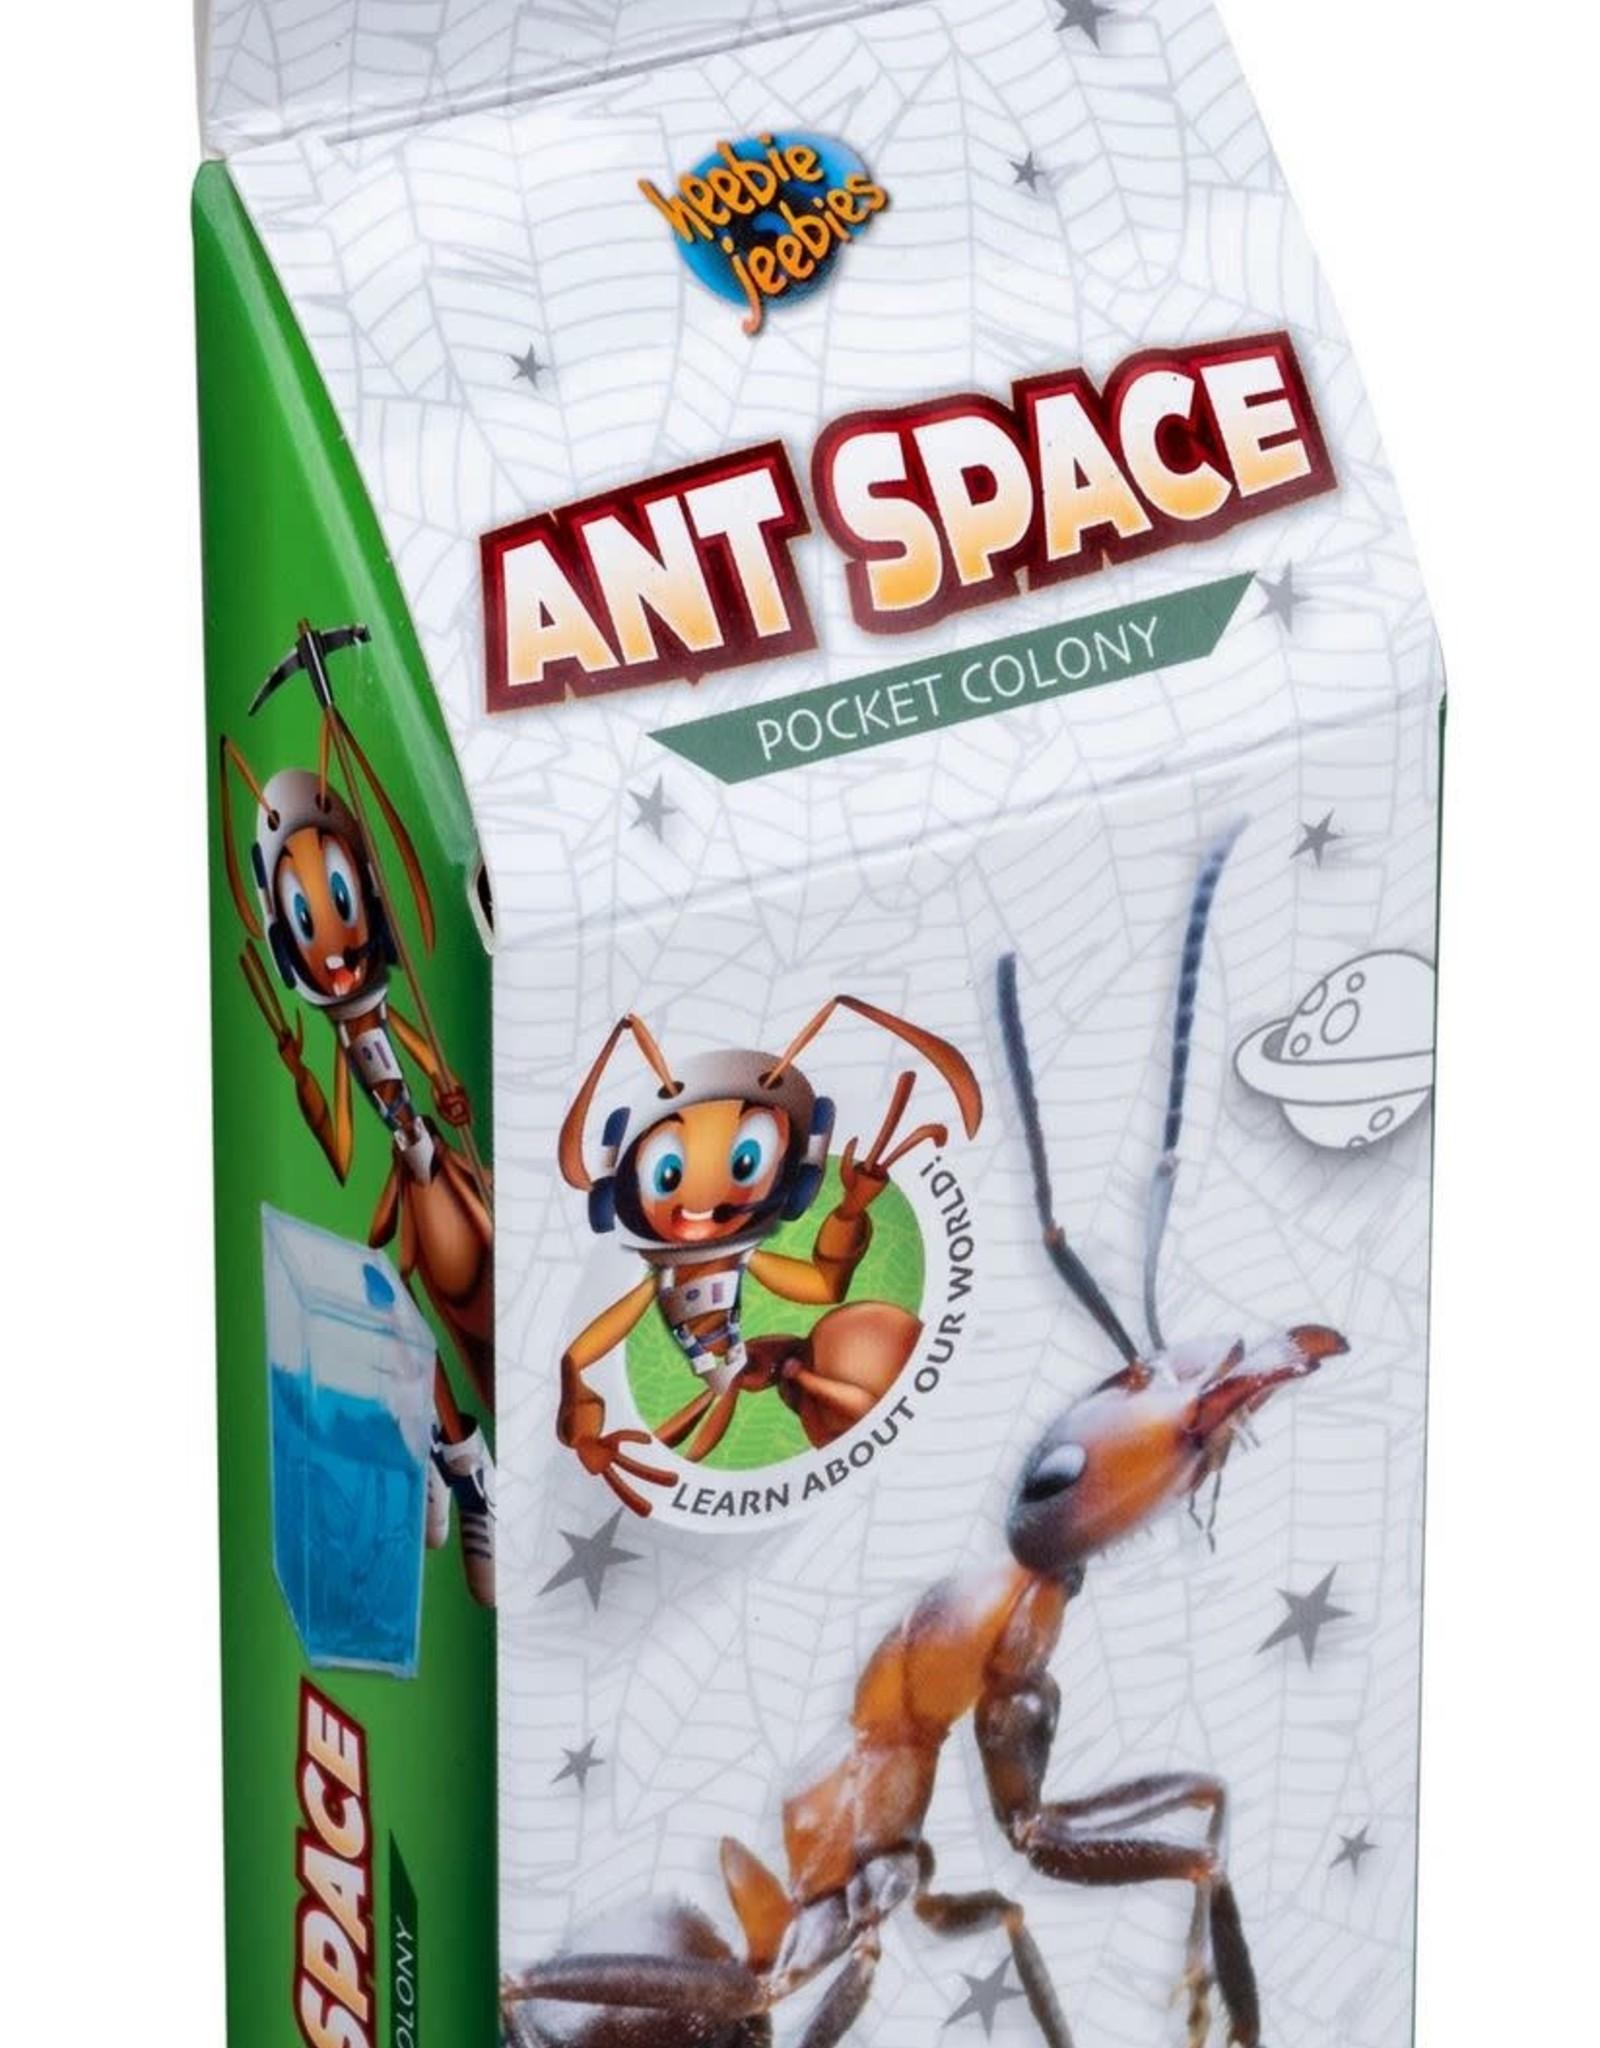 heebies jeebies Ant Space Pocket Colony